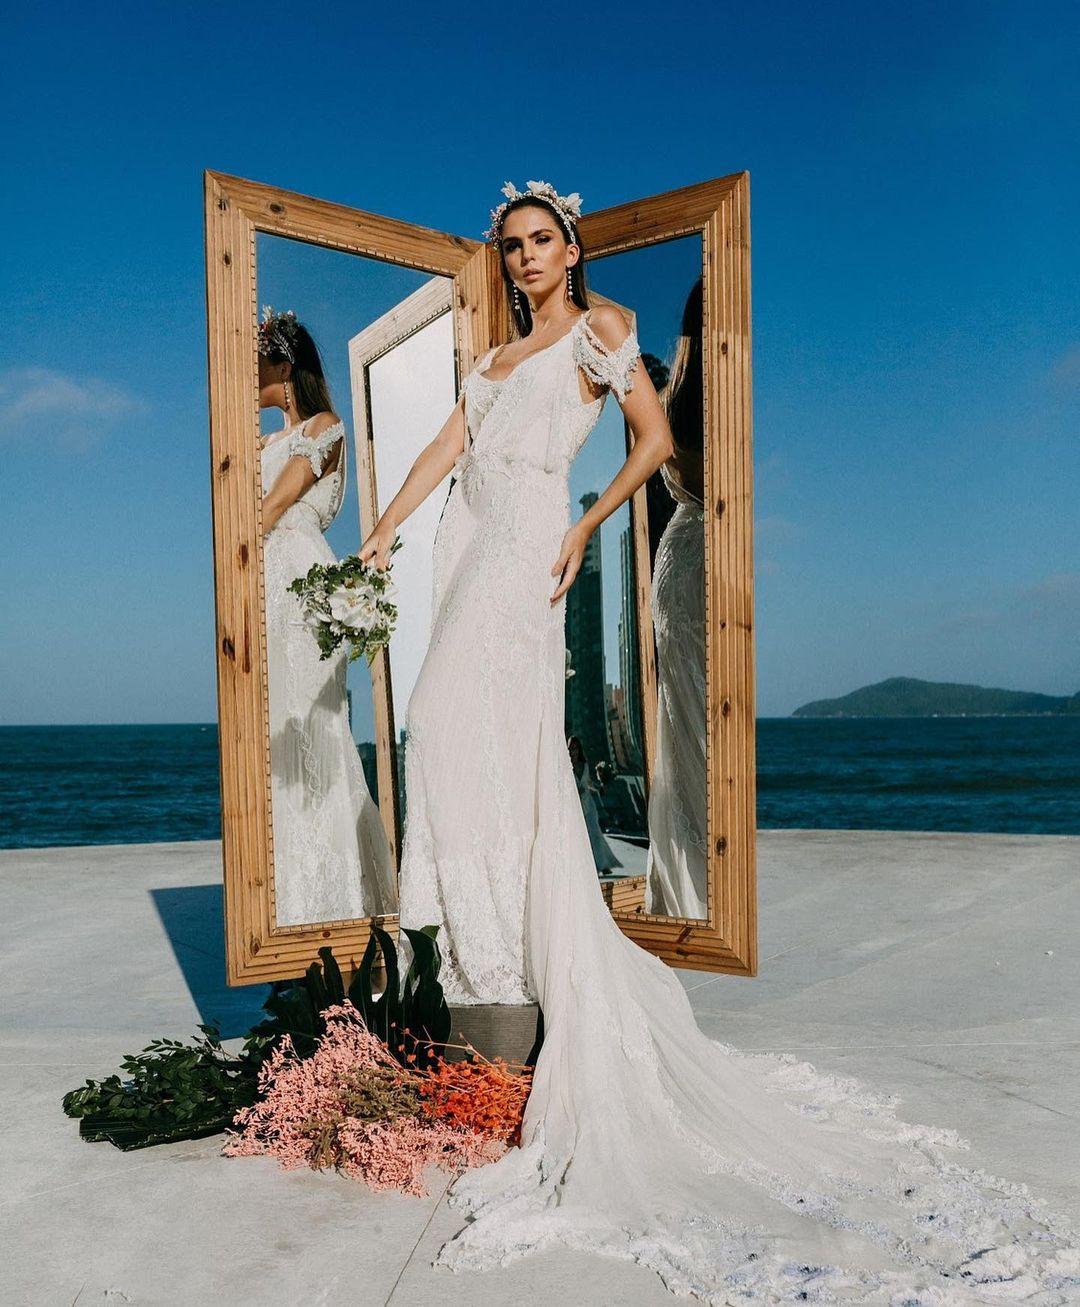 ana flavia giacomini, miss ilha dos lobos mundo 2019. Fvoeln10